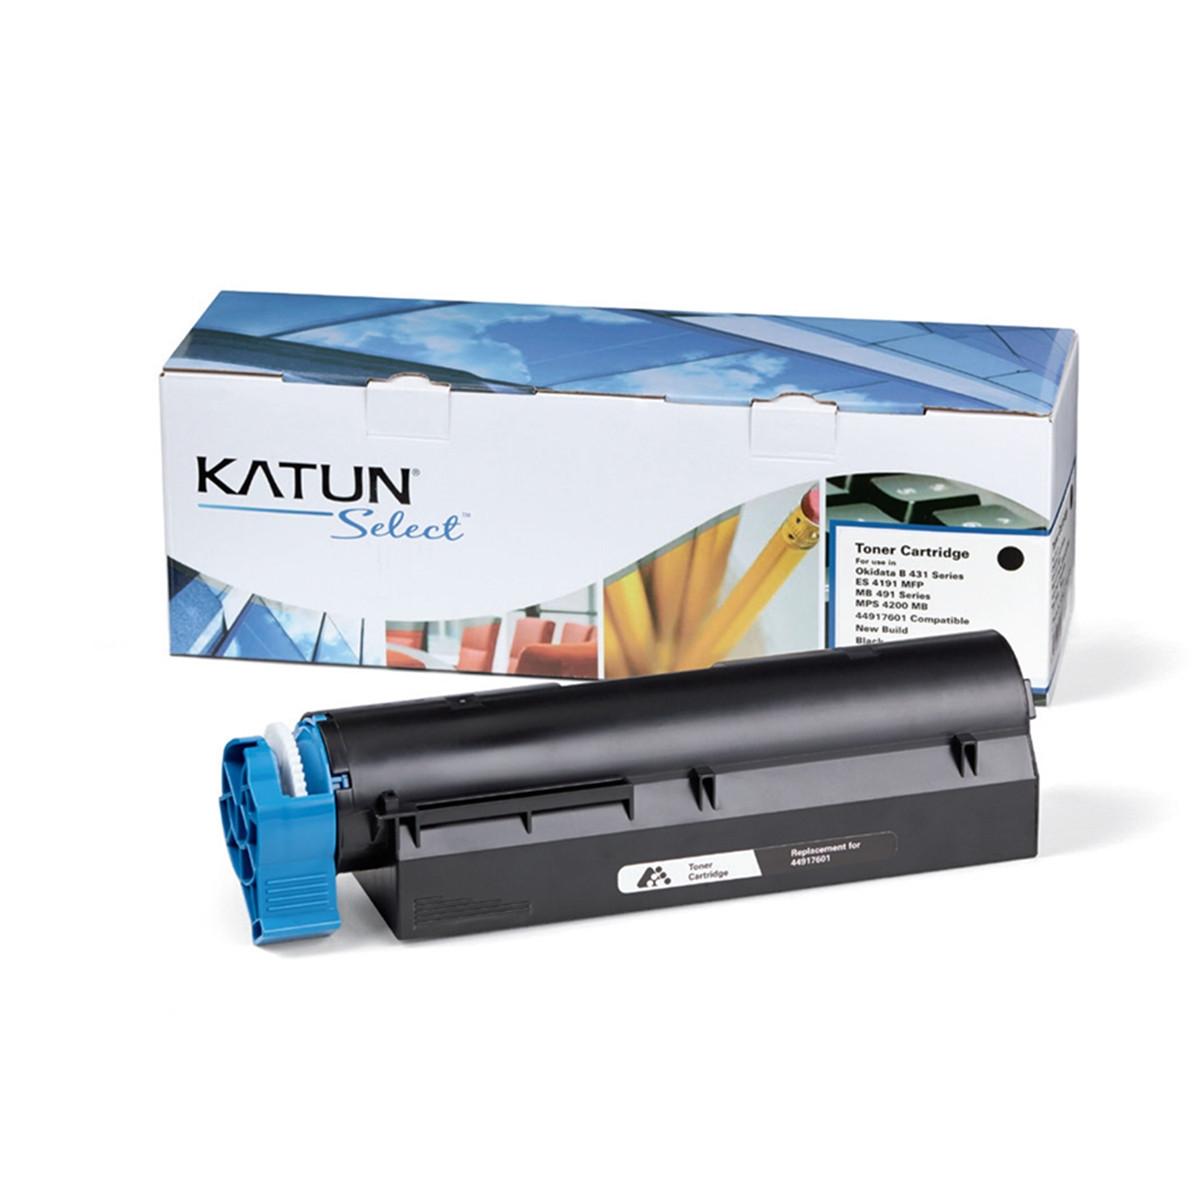 Toner Okidata B431 B431D MB491 B431DN B431DN+ | 44917601 | Katun Select 12k